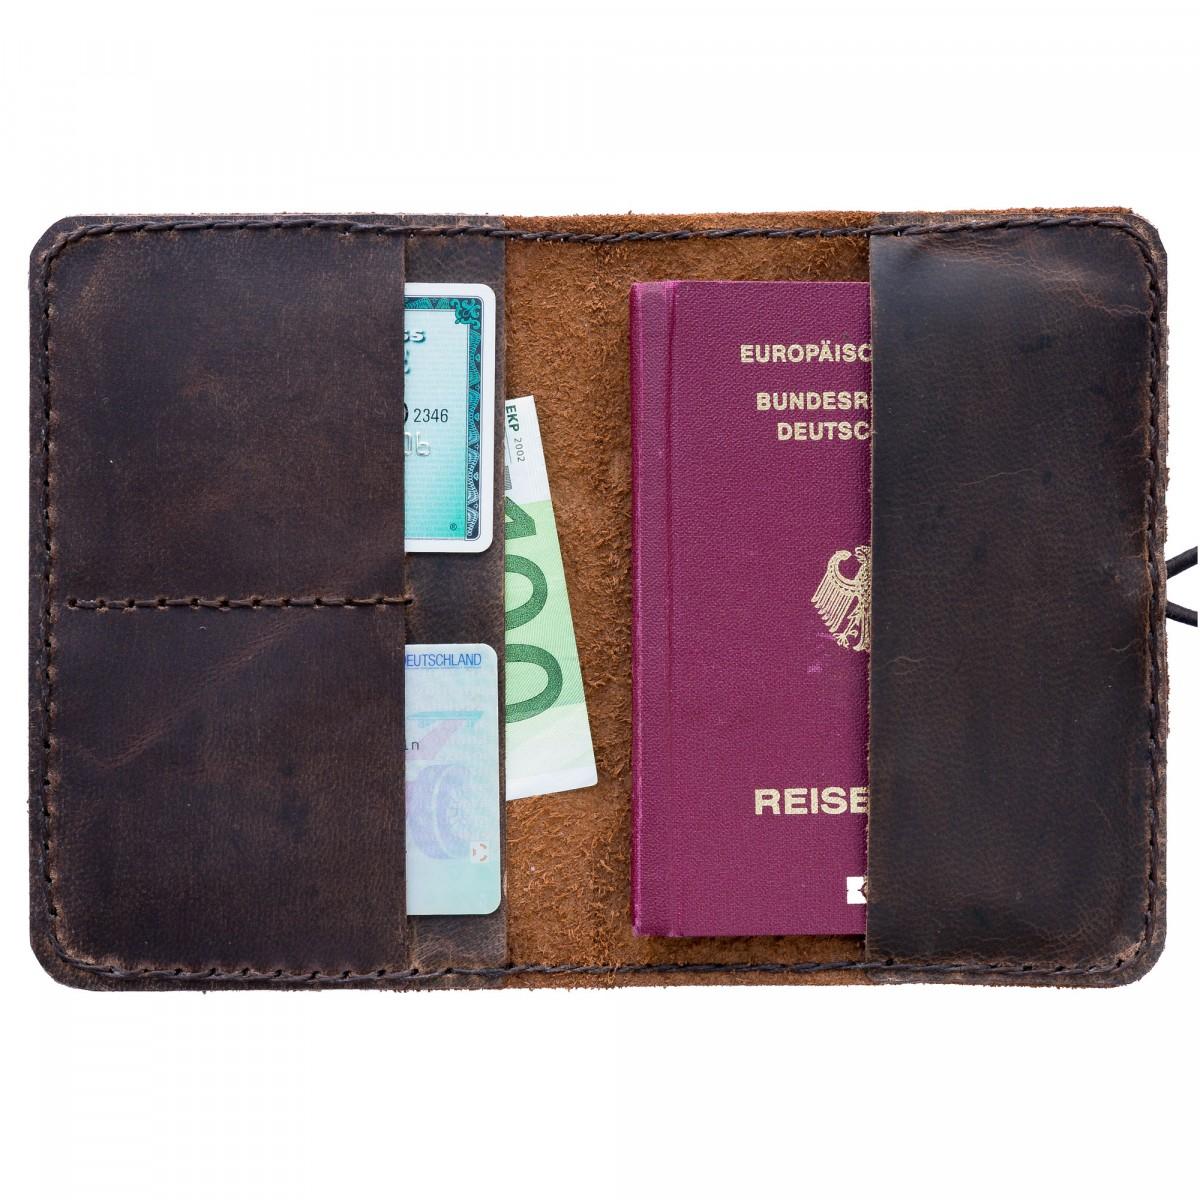 hecho. Reisepasshülle - handgefertigt aus 100% echtem Leder (Reisepassetui, Reisepass)